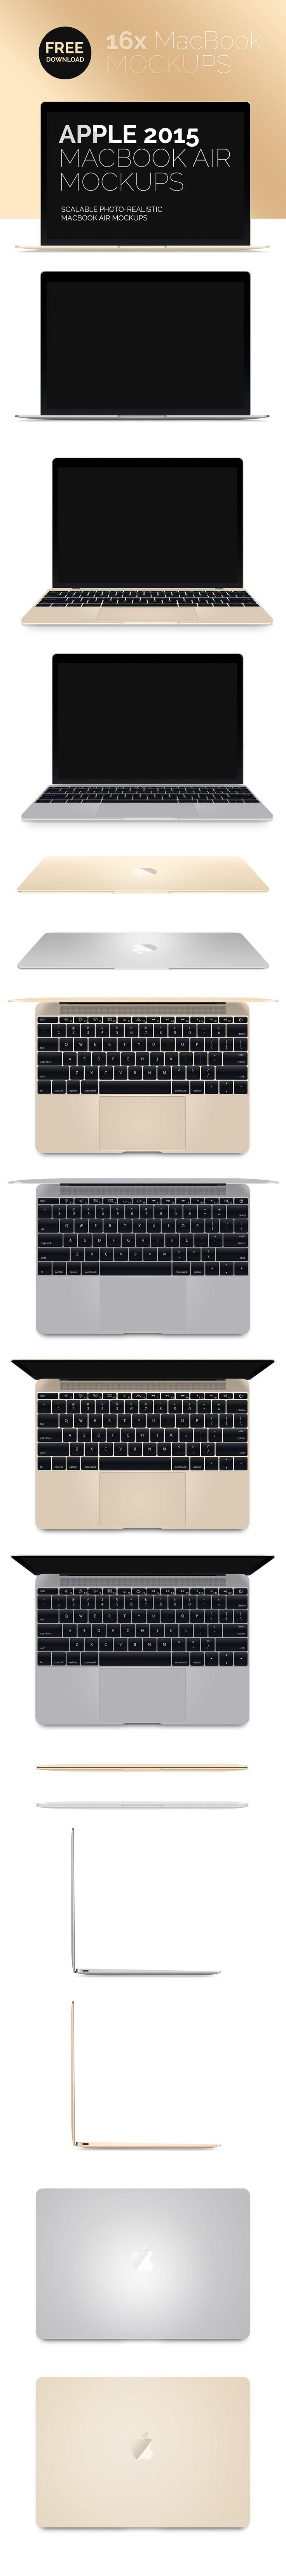 Free New MacBook Air 2015 Mockup (10 MB) | designtory.net